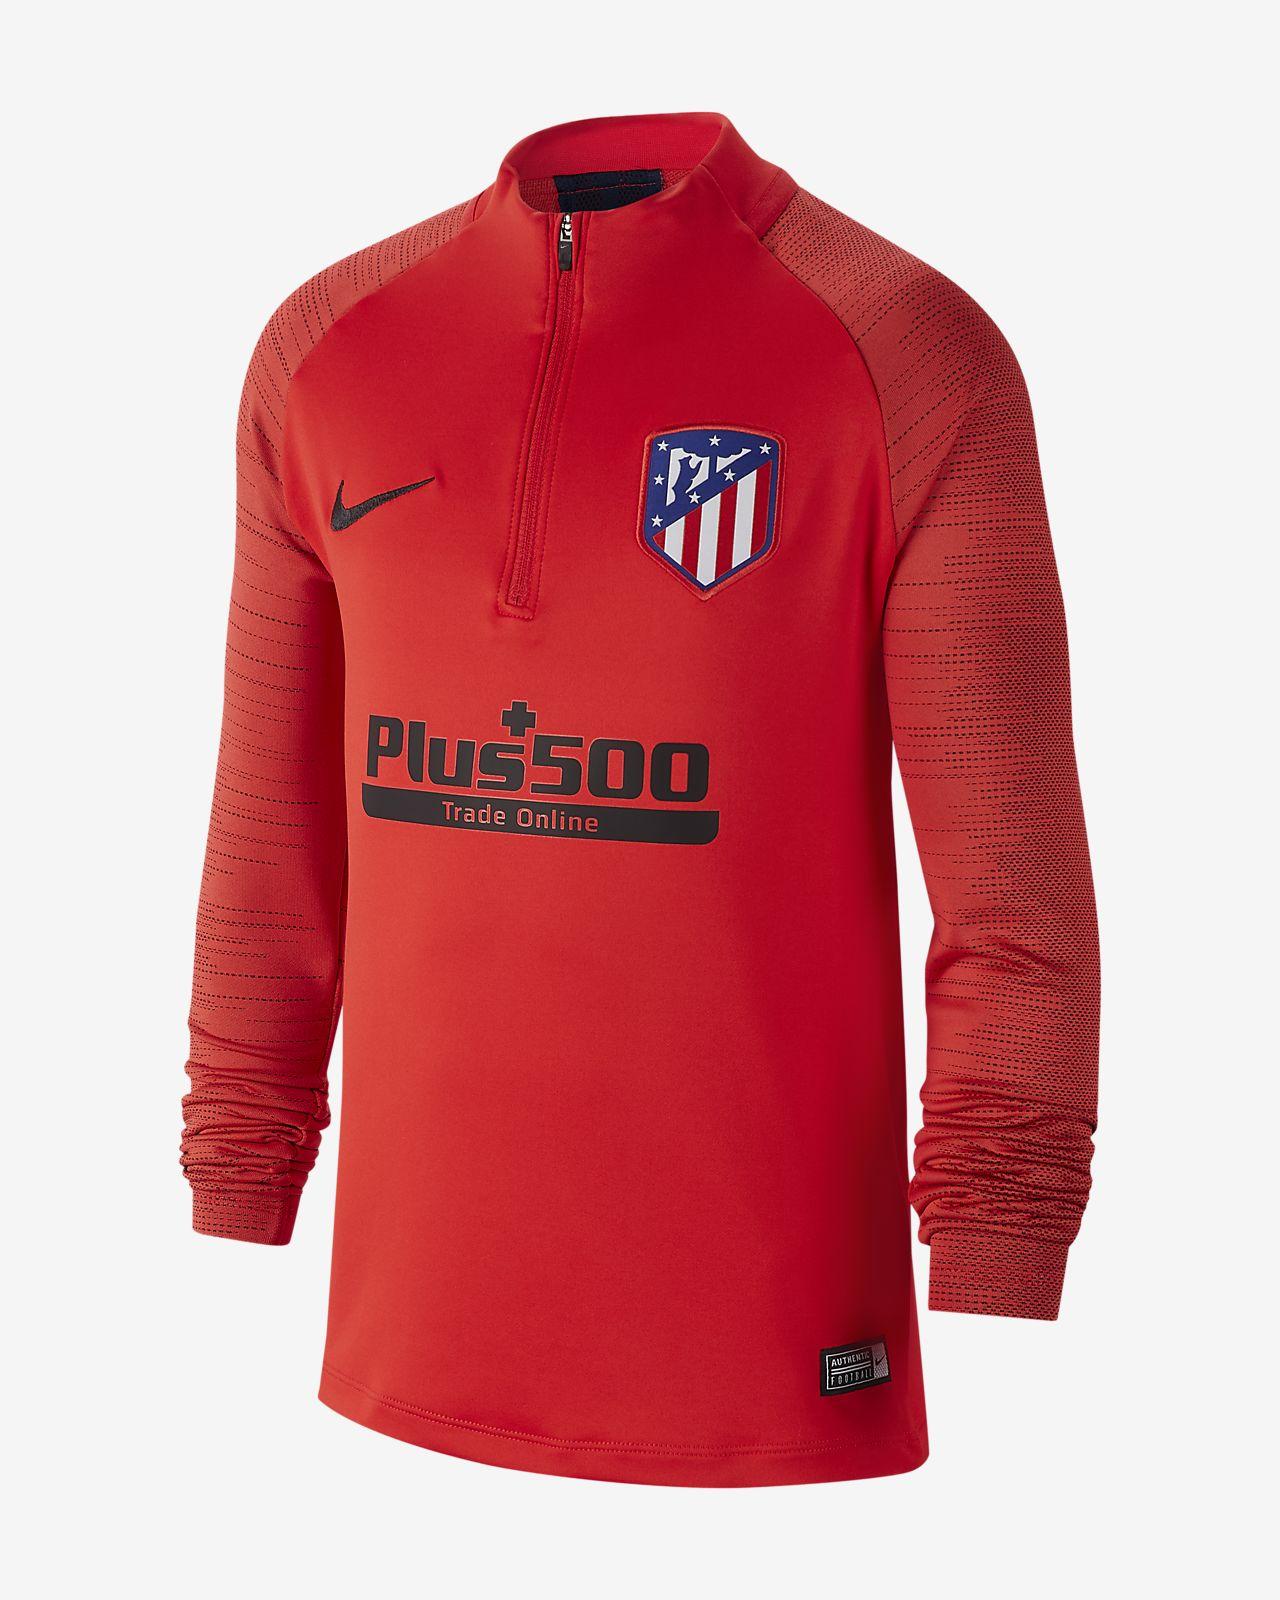 Atlético de Madrid Strike Voetbaltrainingstop voor kids